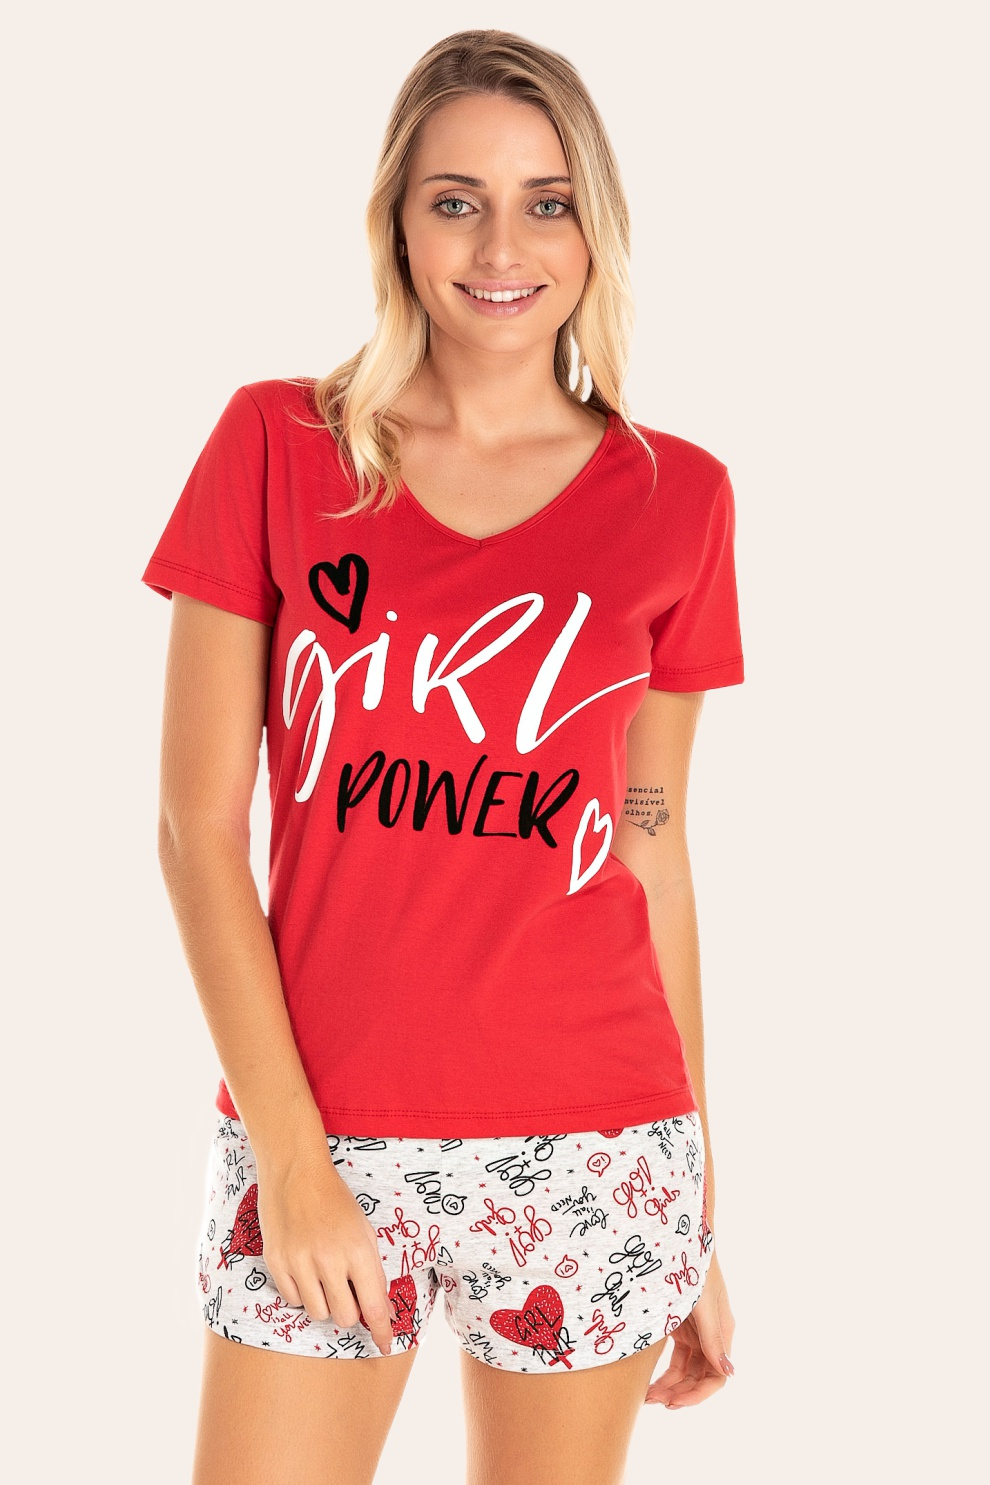 112/I - Short Doll Adulto Feminino Girl Power